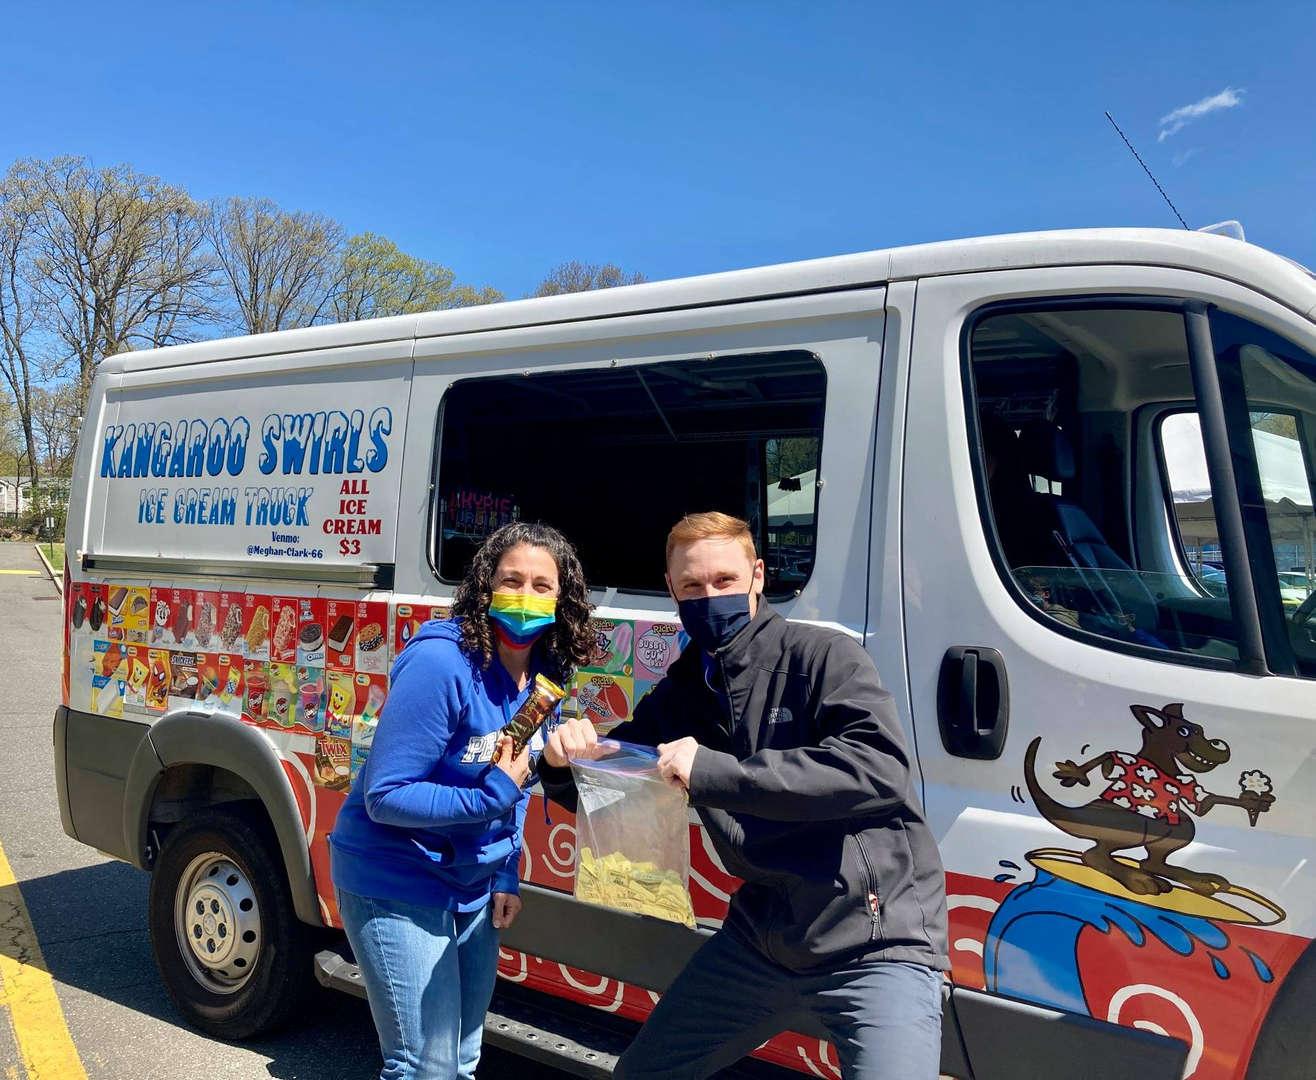 Senior's get an ice cream treat on Senior's Day